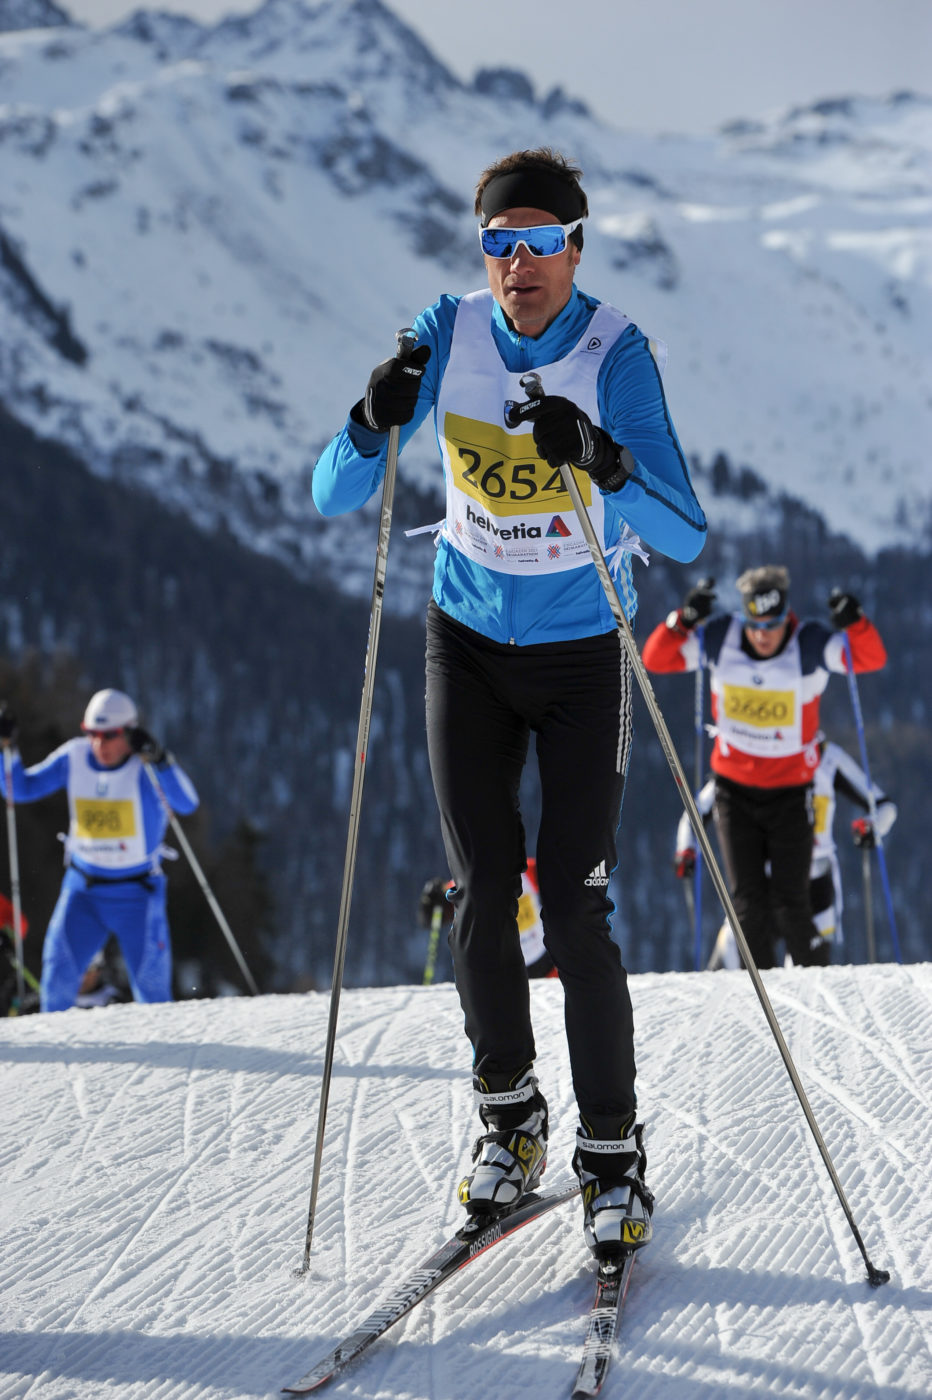 Engadin Skimarathon (12. März 2017)